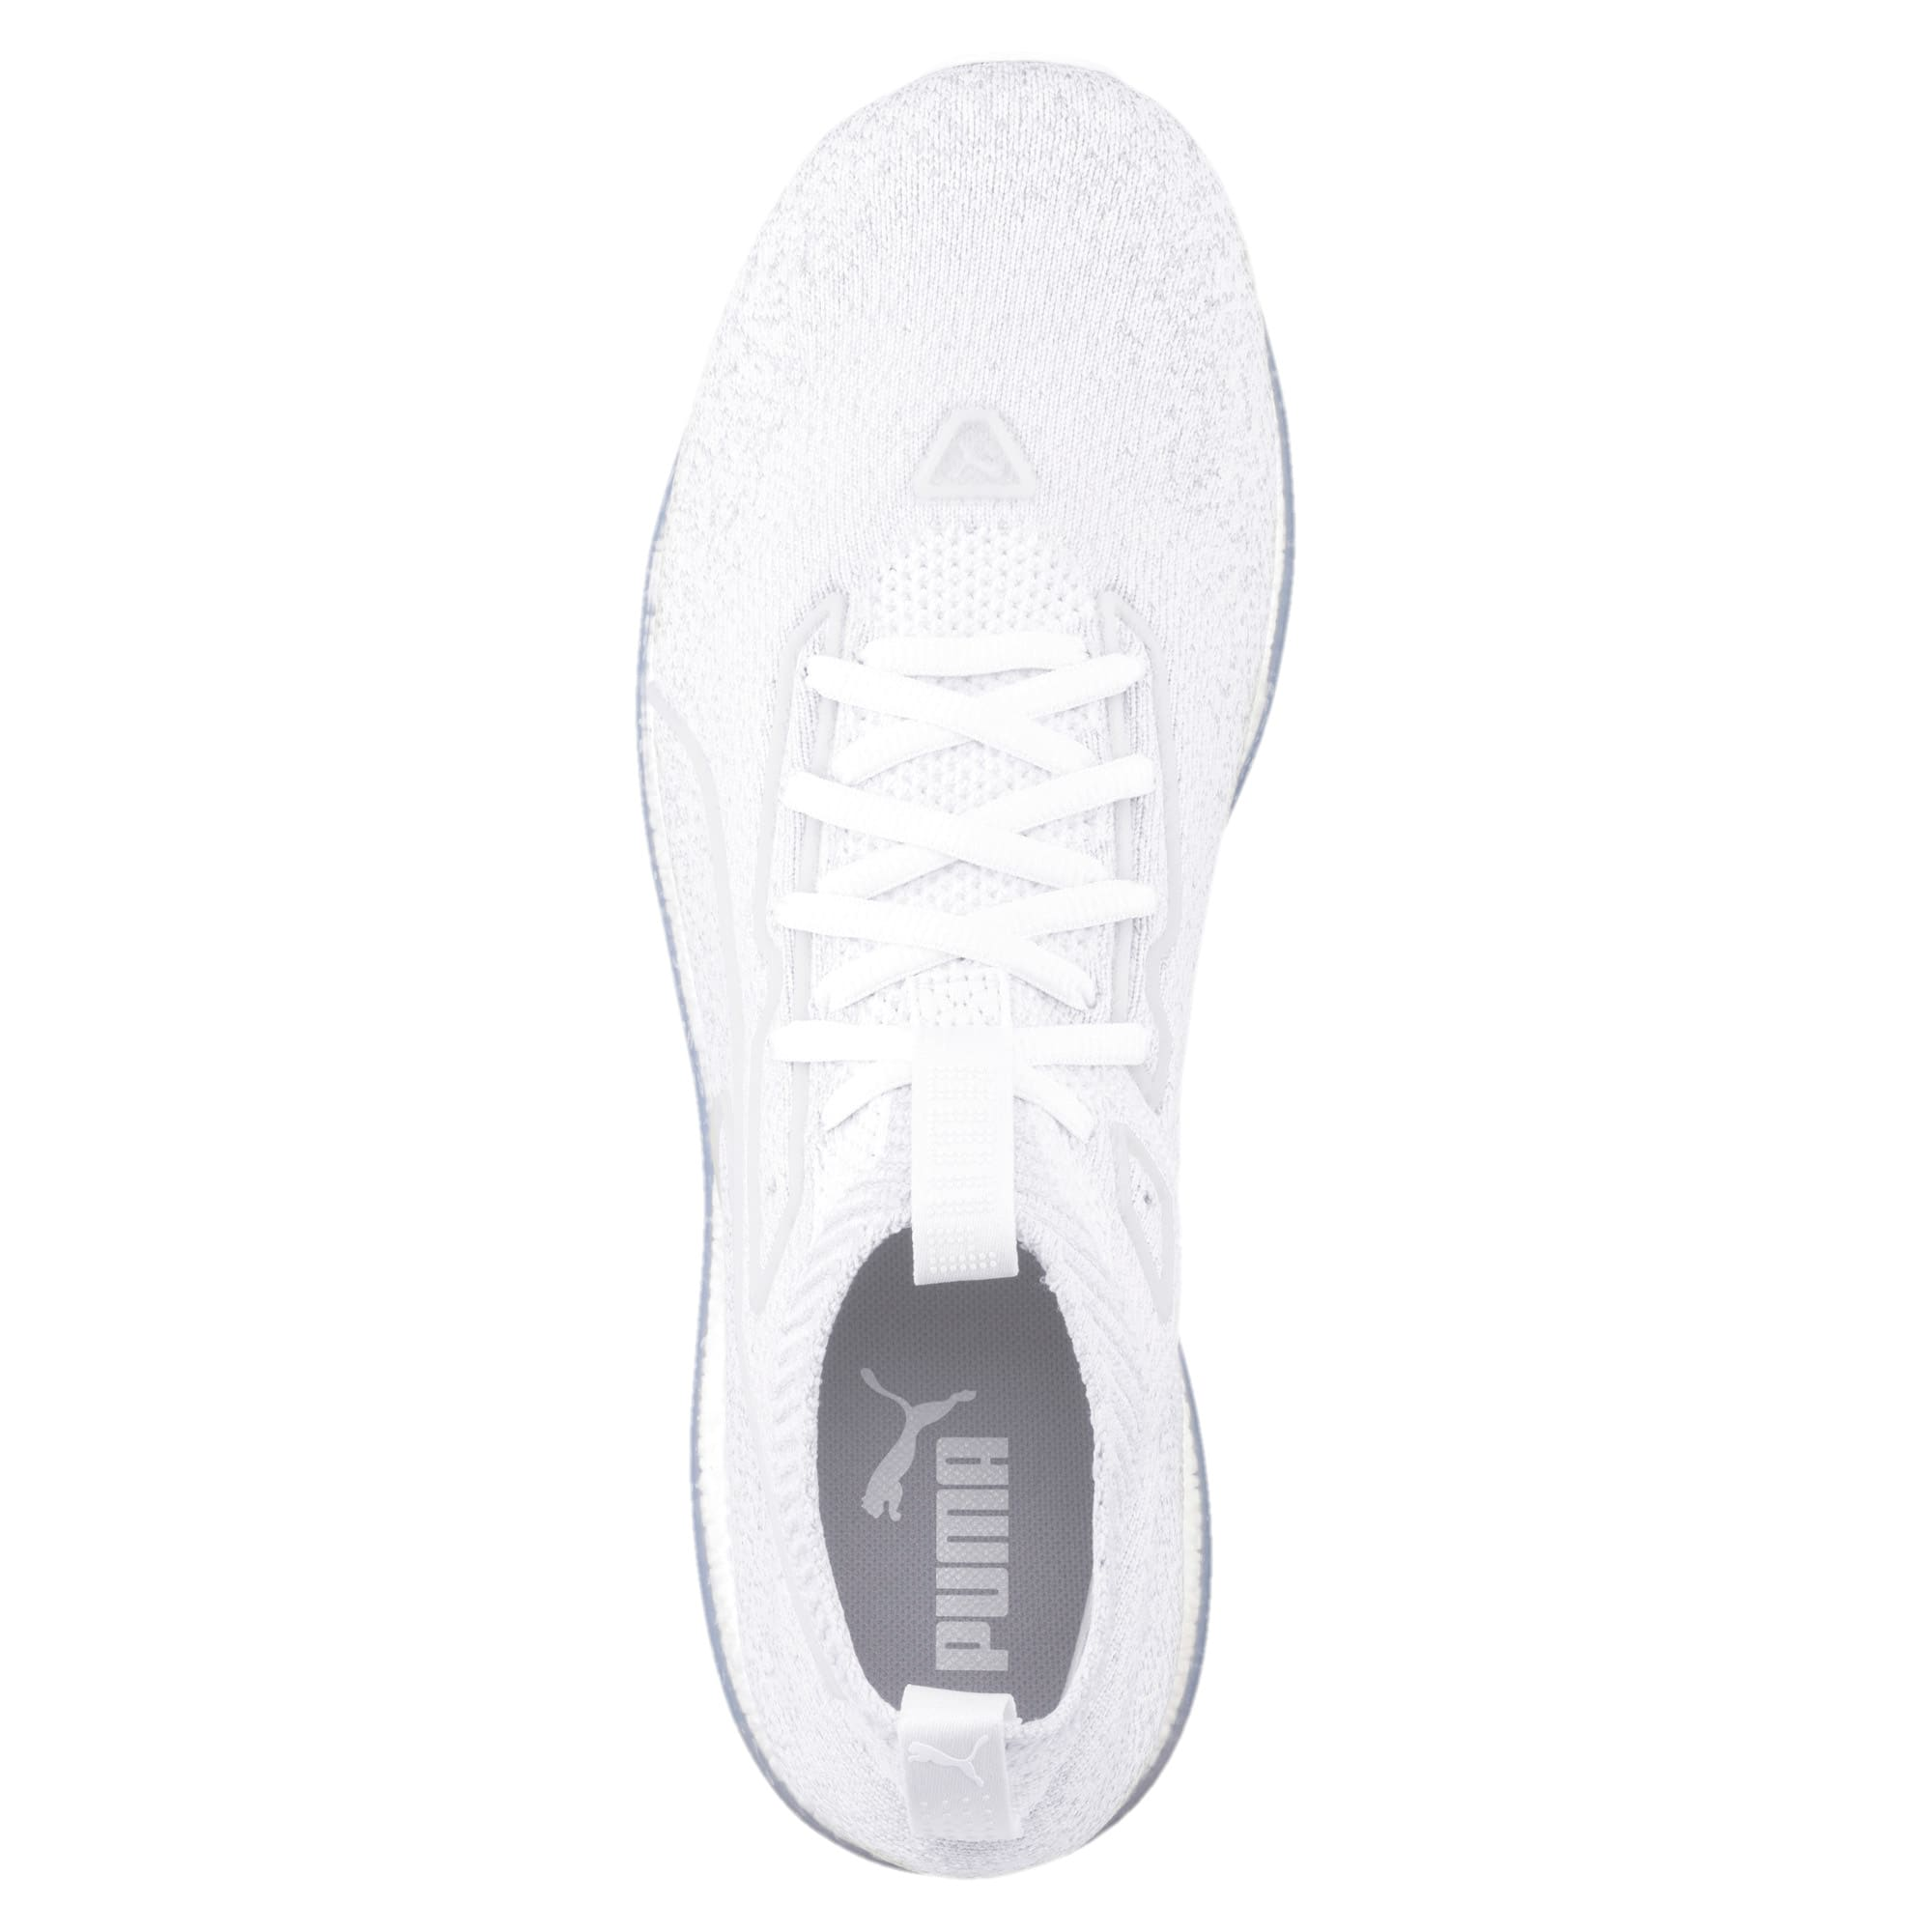 Thumbnail 5 of Jamming Men's Running Shoes, Puma White-Puma White, medium